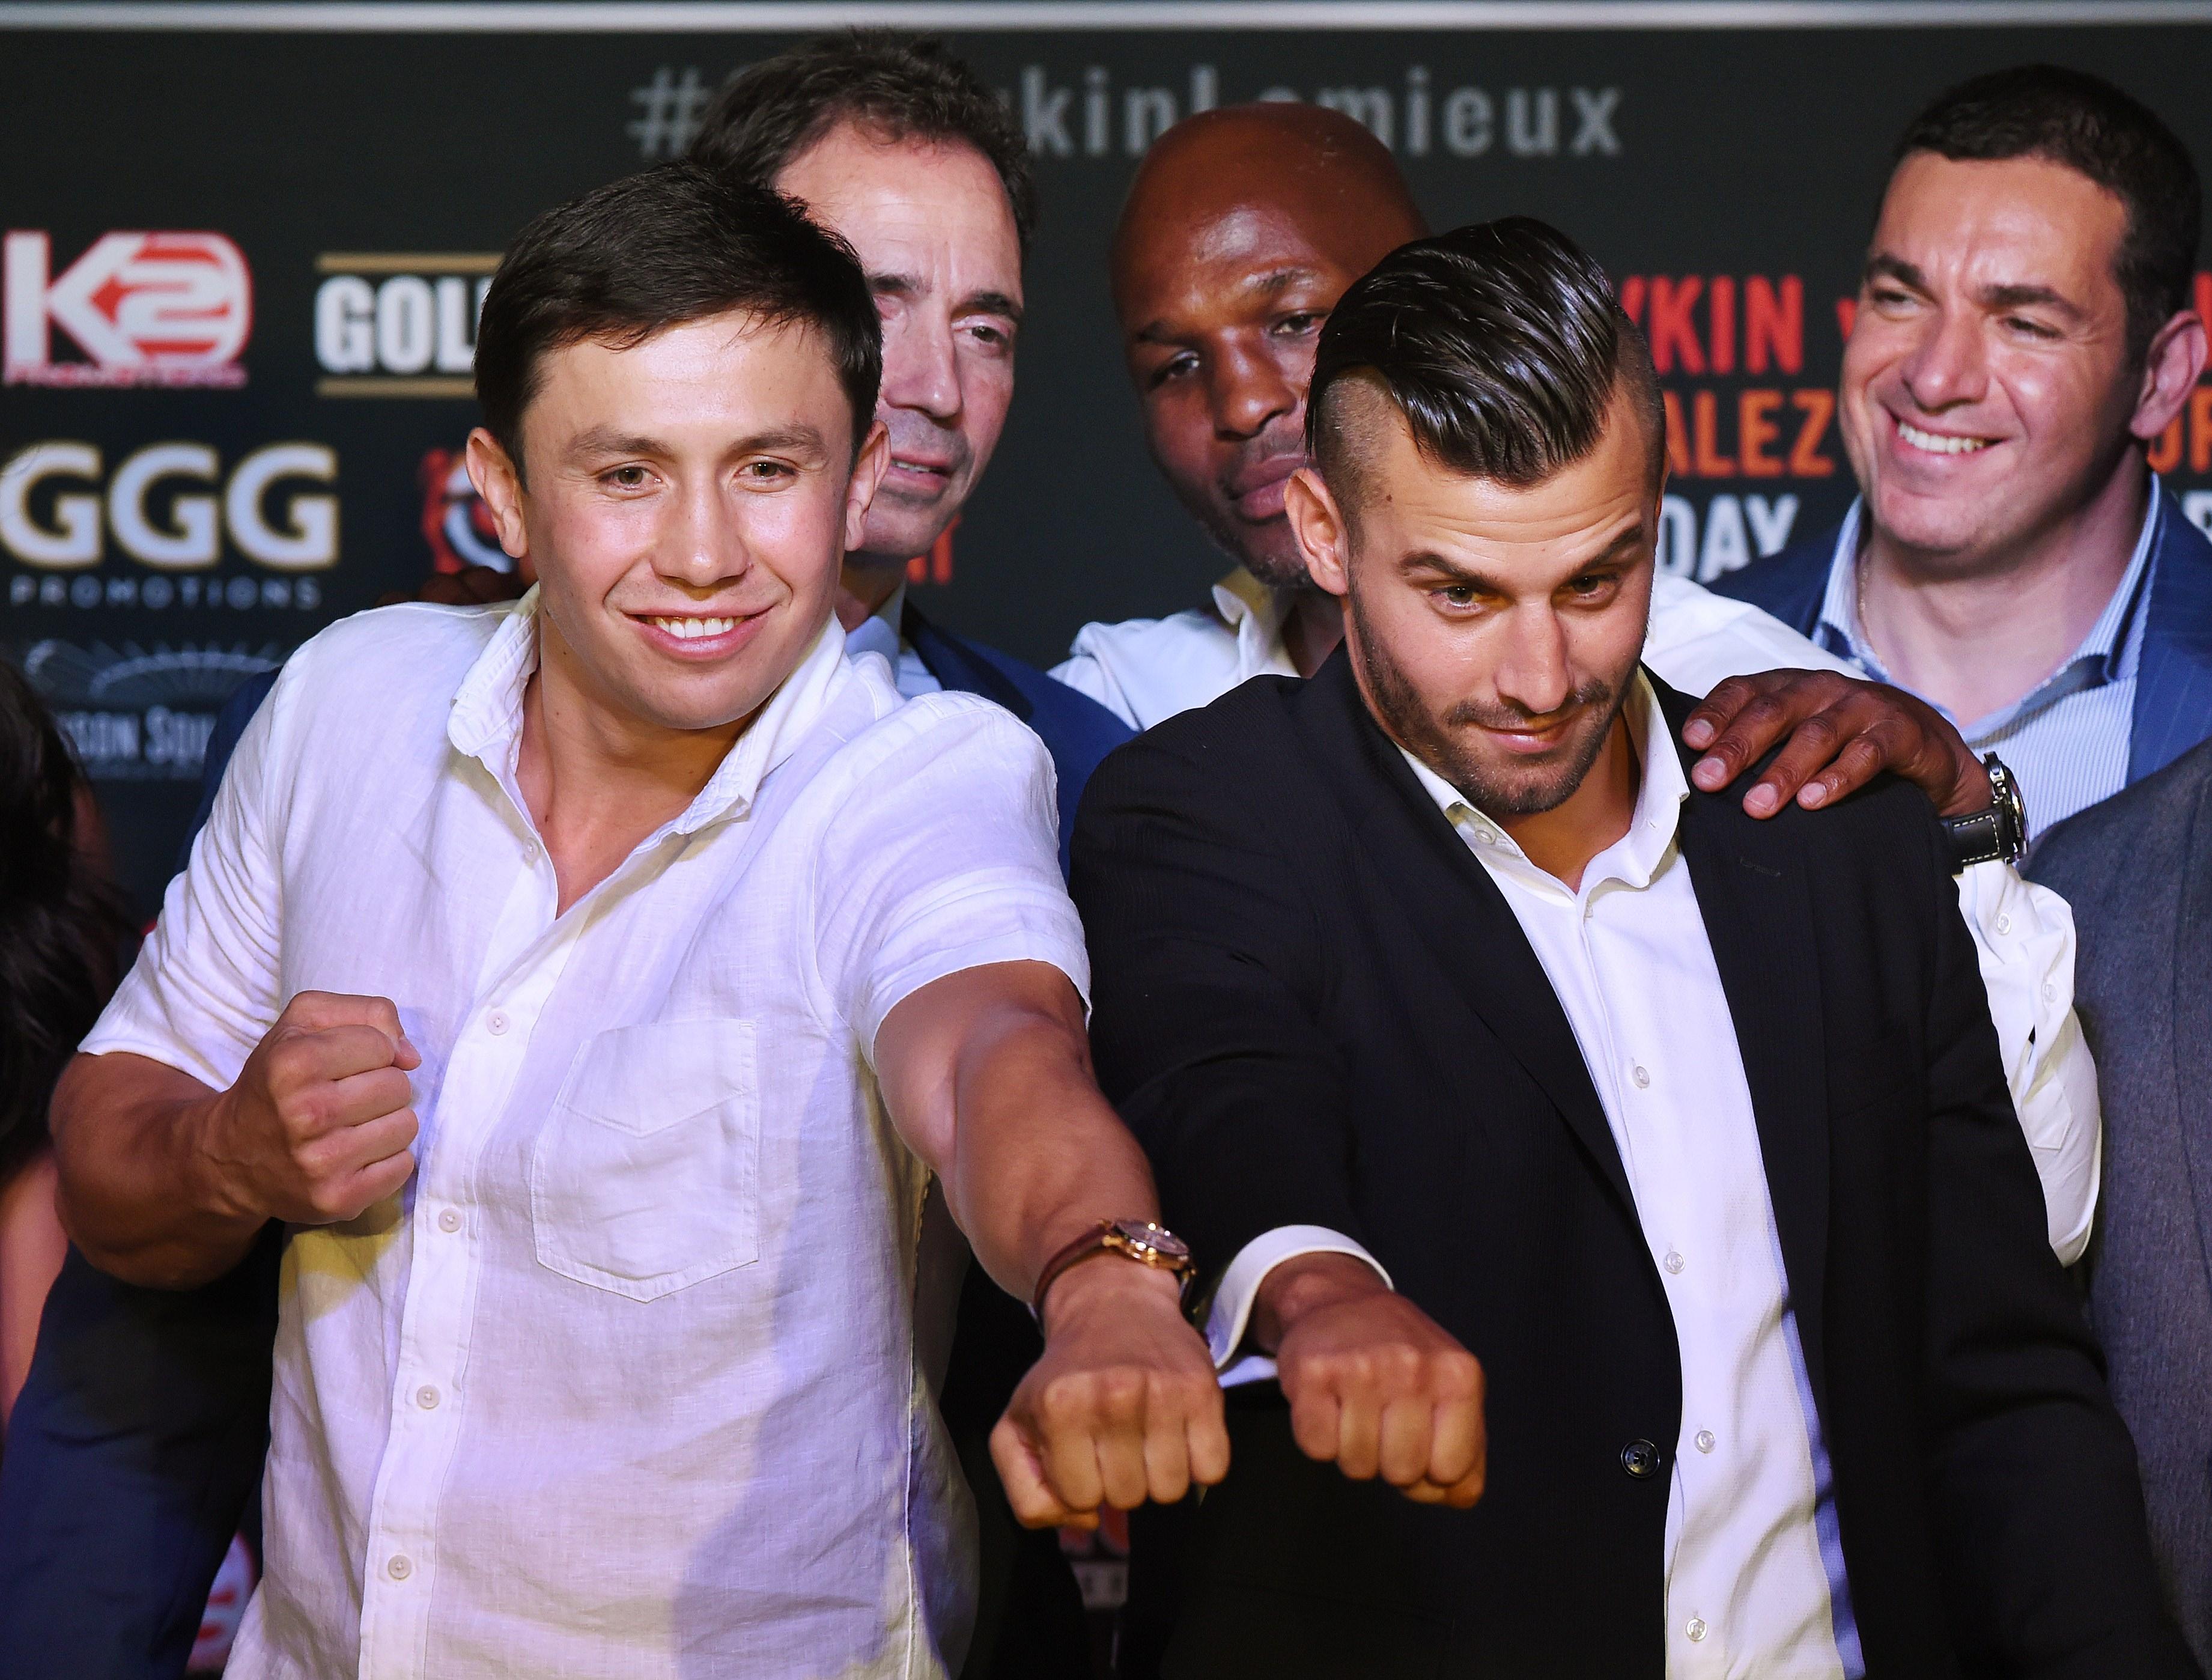 Boxing News: 'GGG' Golovkin vs David Lemieux Predictions, Gennady 'GGG' Golovkin vs. David Lemieux who wins, Gennady 'GGG' Golovkin vs. David Lemieux winner, Gennady 'GGG' Golovkin vs. David Lemieux time, Gennady 'GGG' Golovkin vs. David Lemieux date, Gennady 'GGG' Golovkin vs. David Lemieux channel, Golovkin vs Lemieux Predictions, Golovkin vs. Lemieux who wins, Golovkin vs. Lemieux winner, Golovkin vs. Lemieux time, Golovkin vs. Lemieux date, Golovkin vs. Lemieux channel,